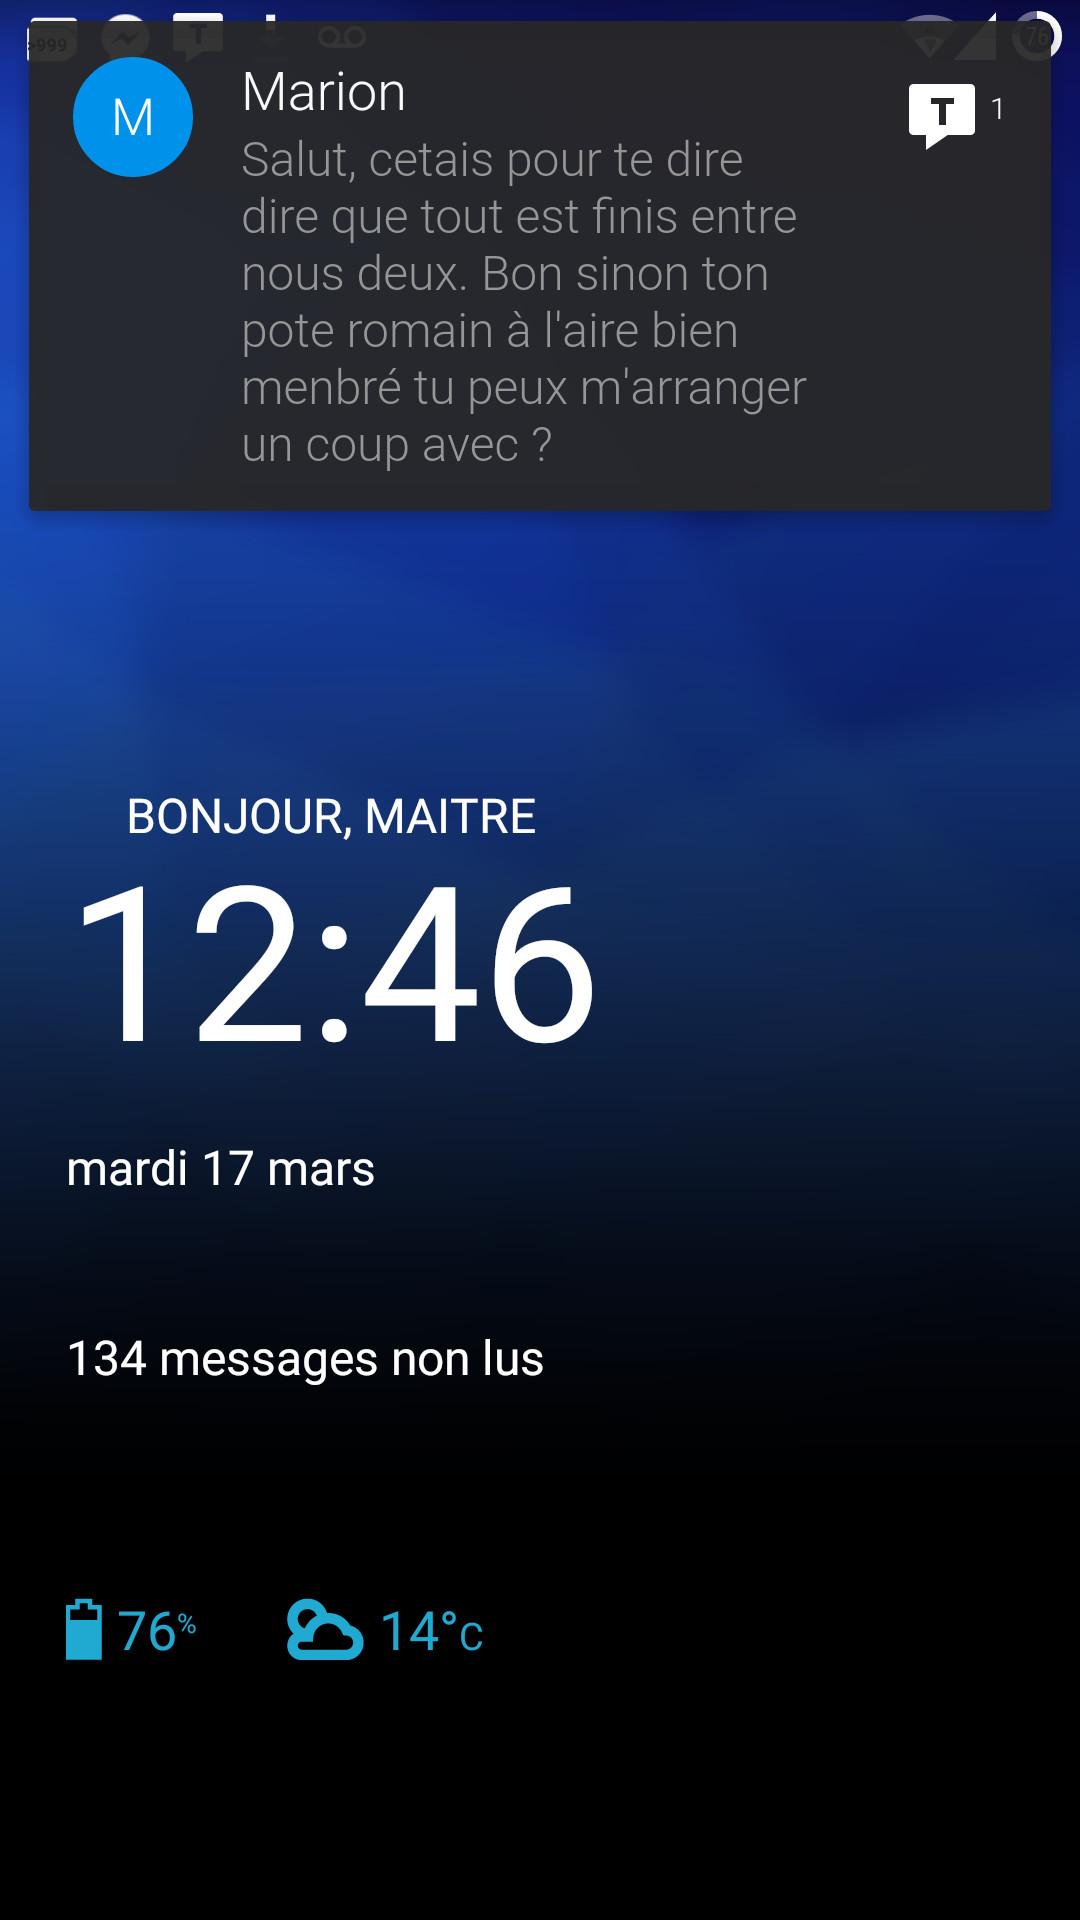 Mdrrr loool xDDDD paysan..... Breton ! - meme